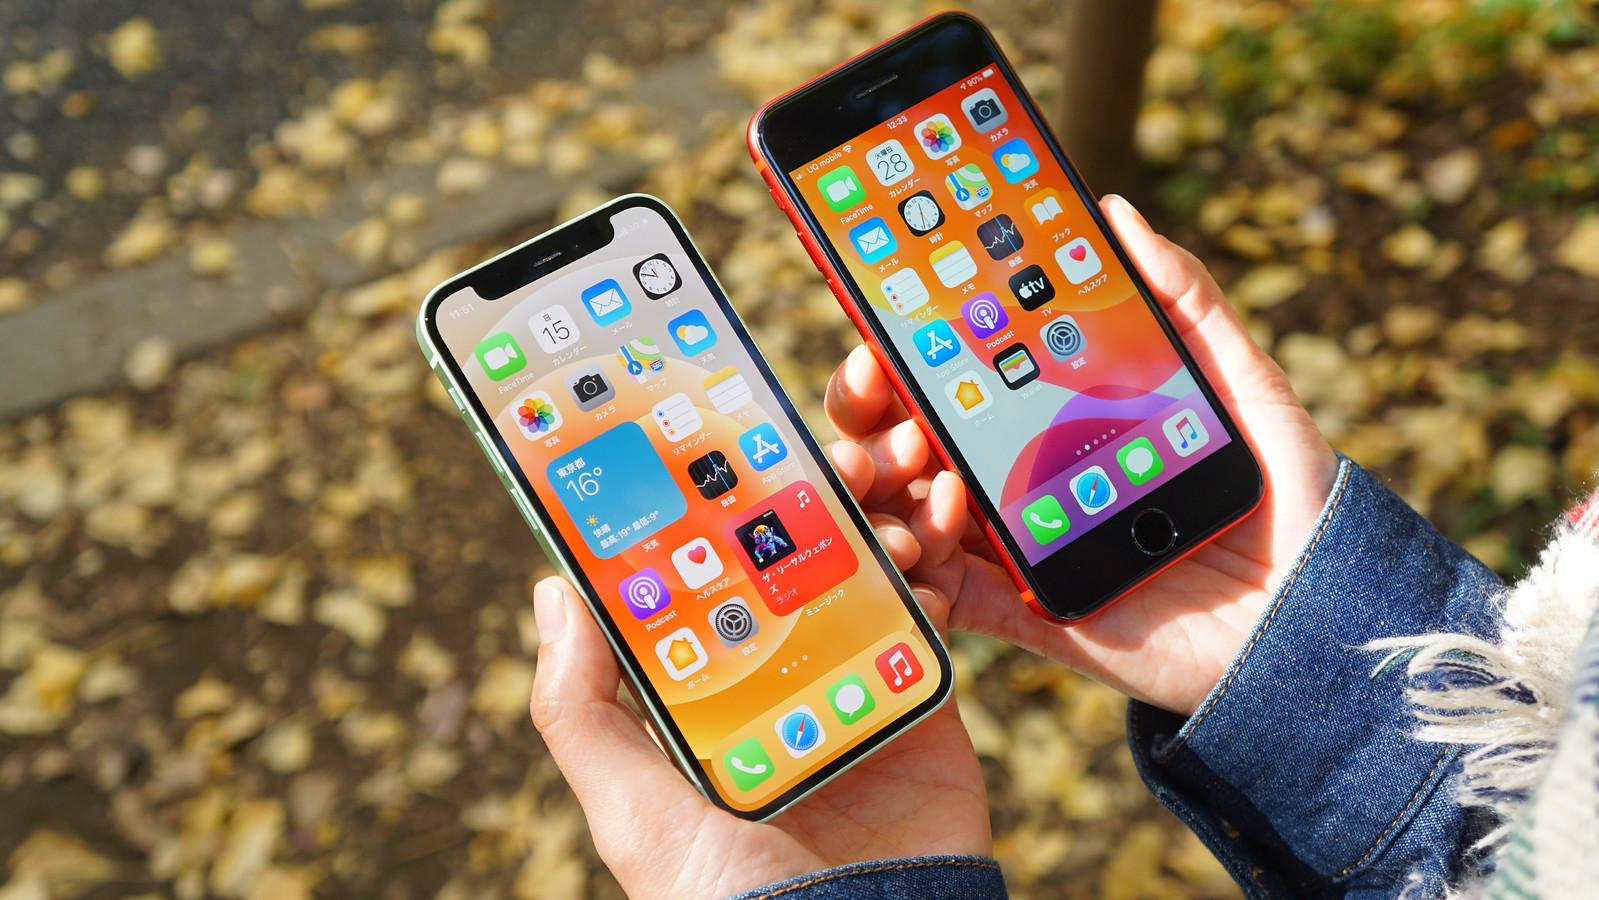 「iPhone 12 mini」と第2世代「iPhone SE」を比較